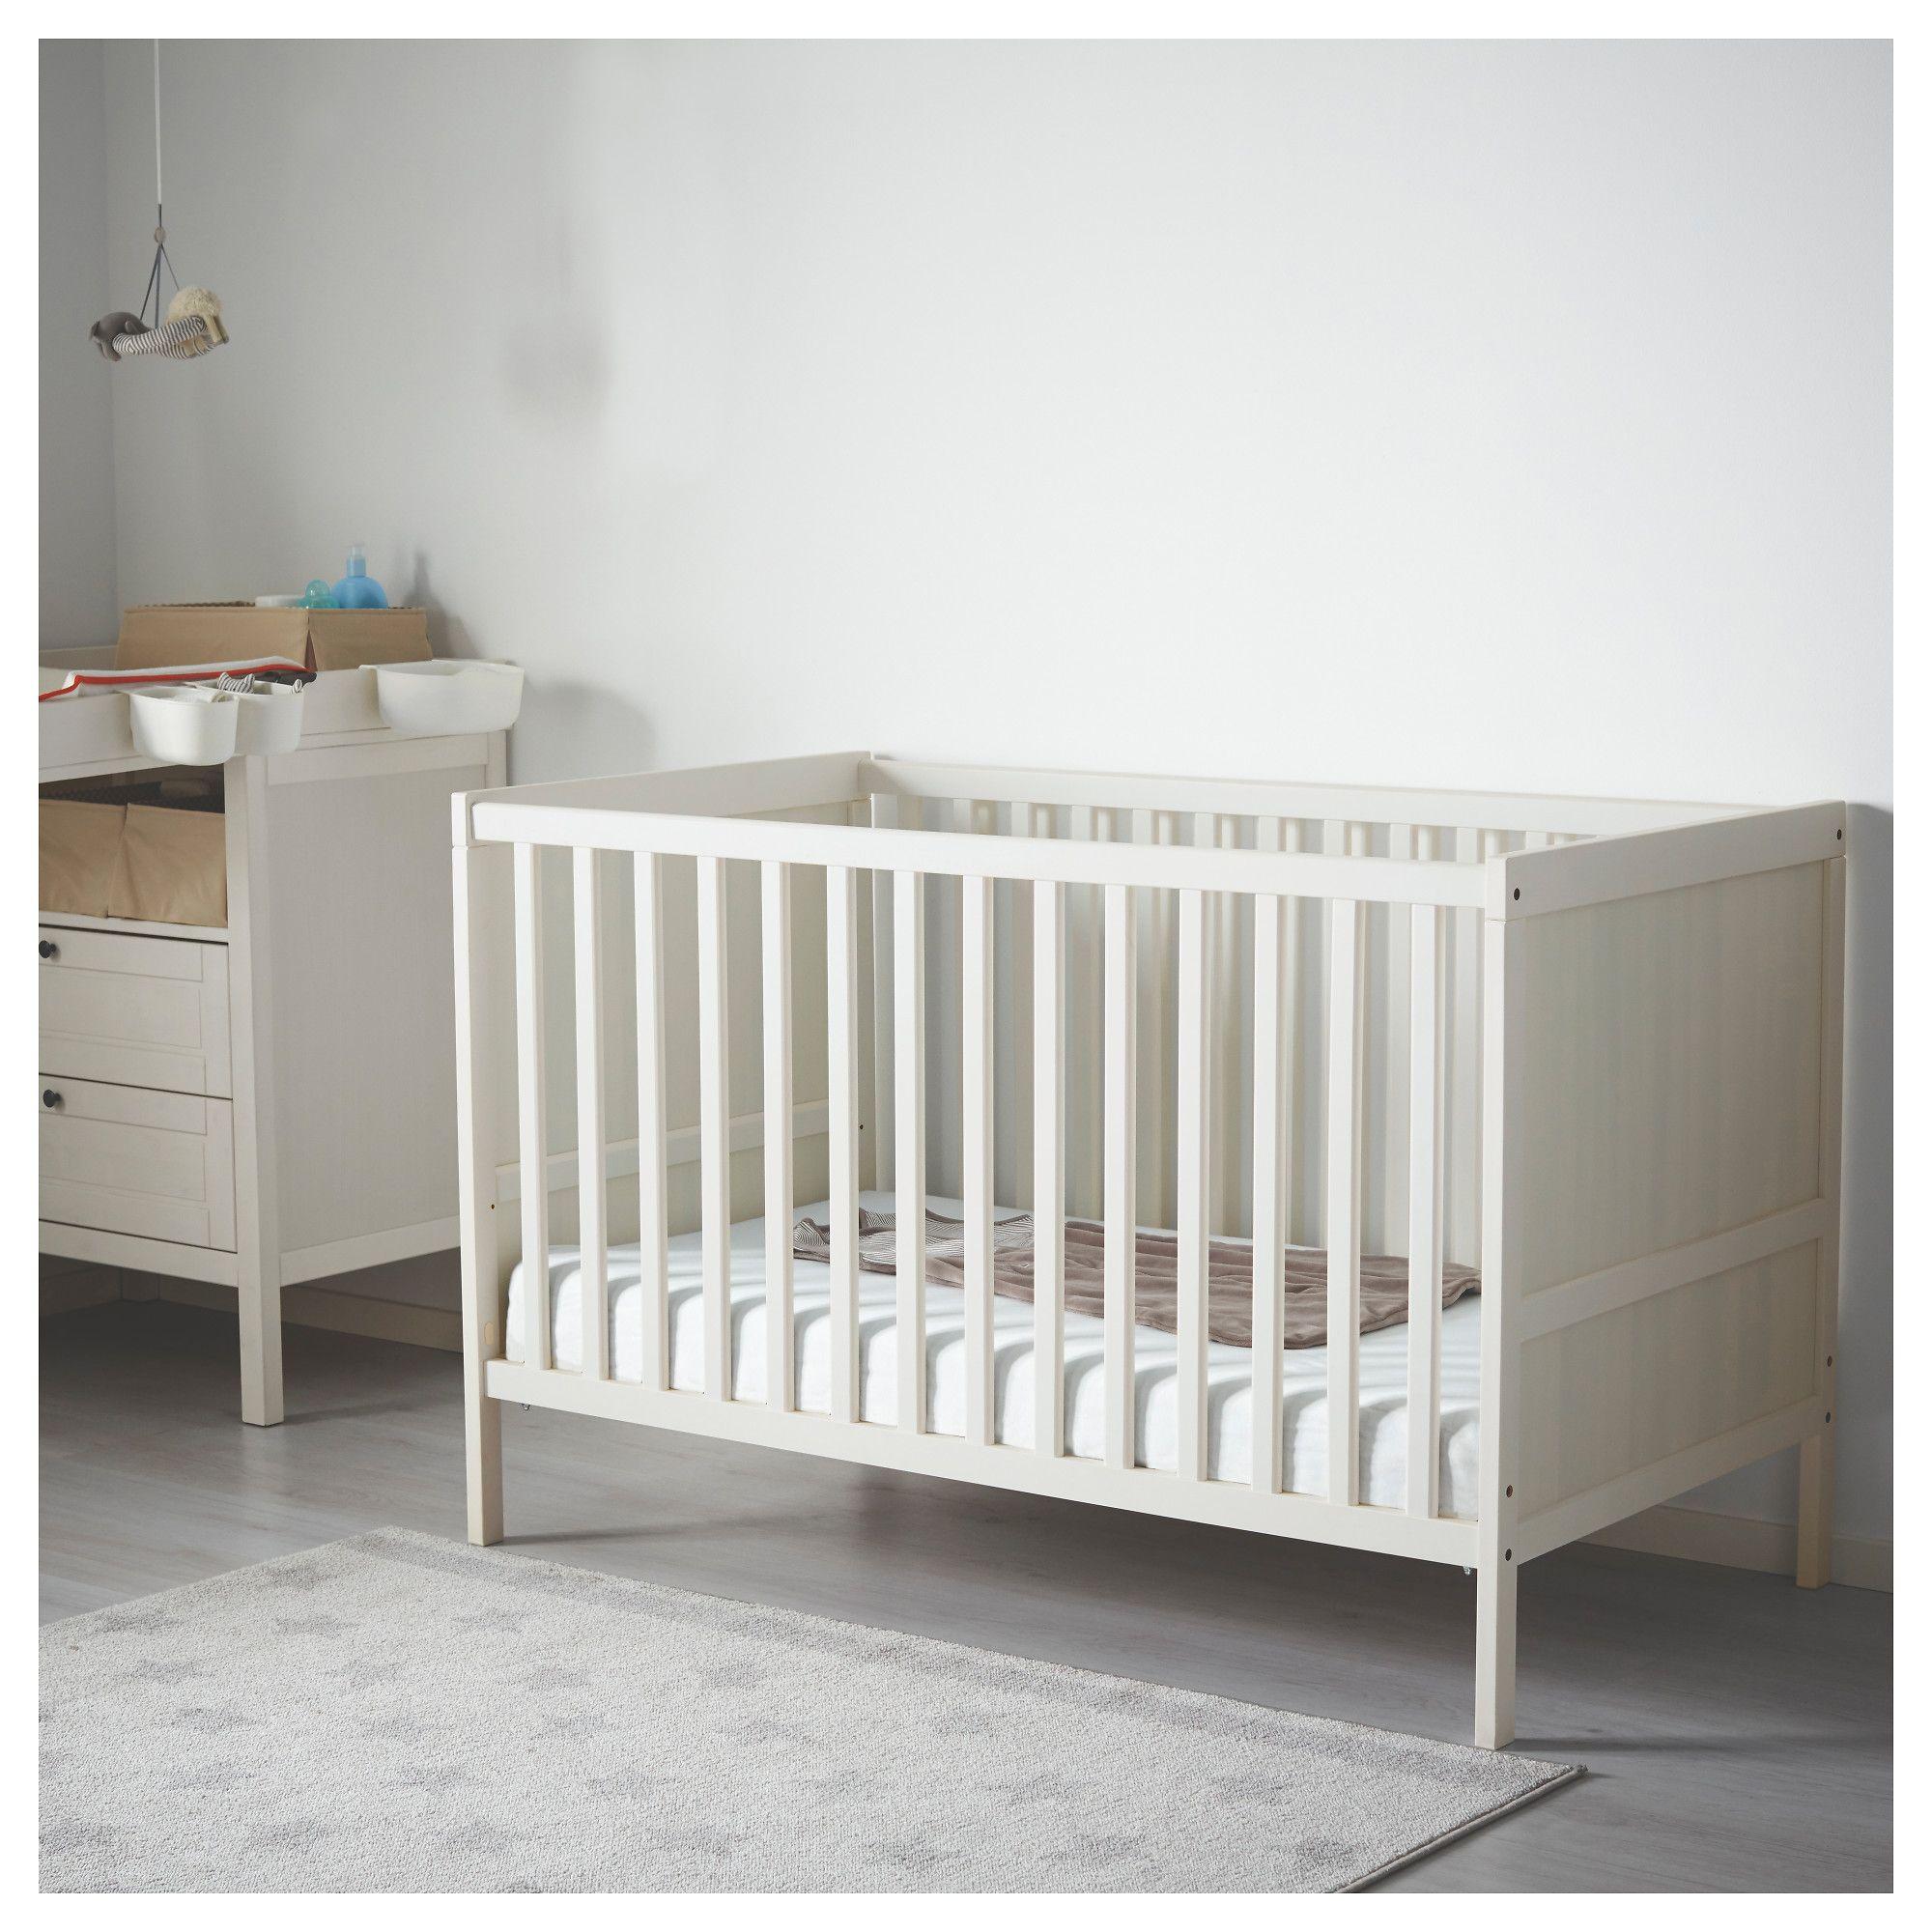 Furniture and Home Furnishings Ikea sundvik, Ikea crib